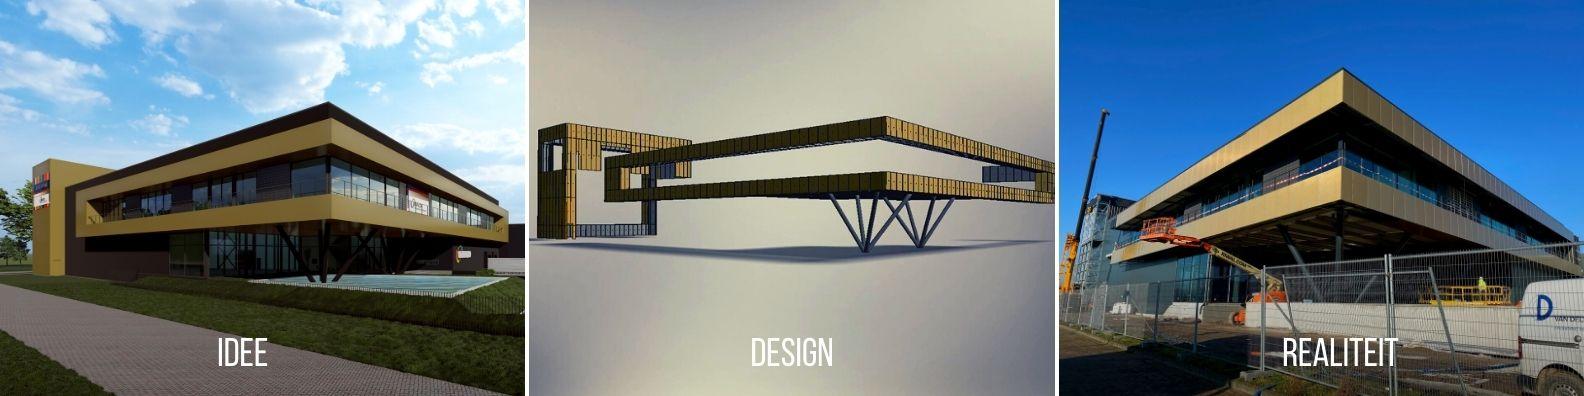 idee-design-realiteit-gevelbouw-univacco-allpro